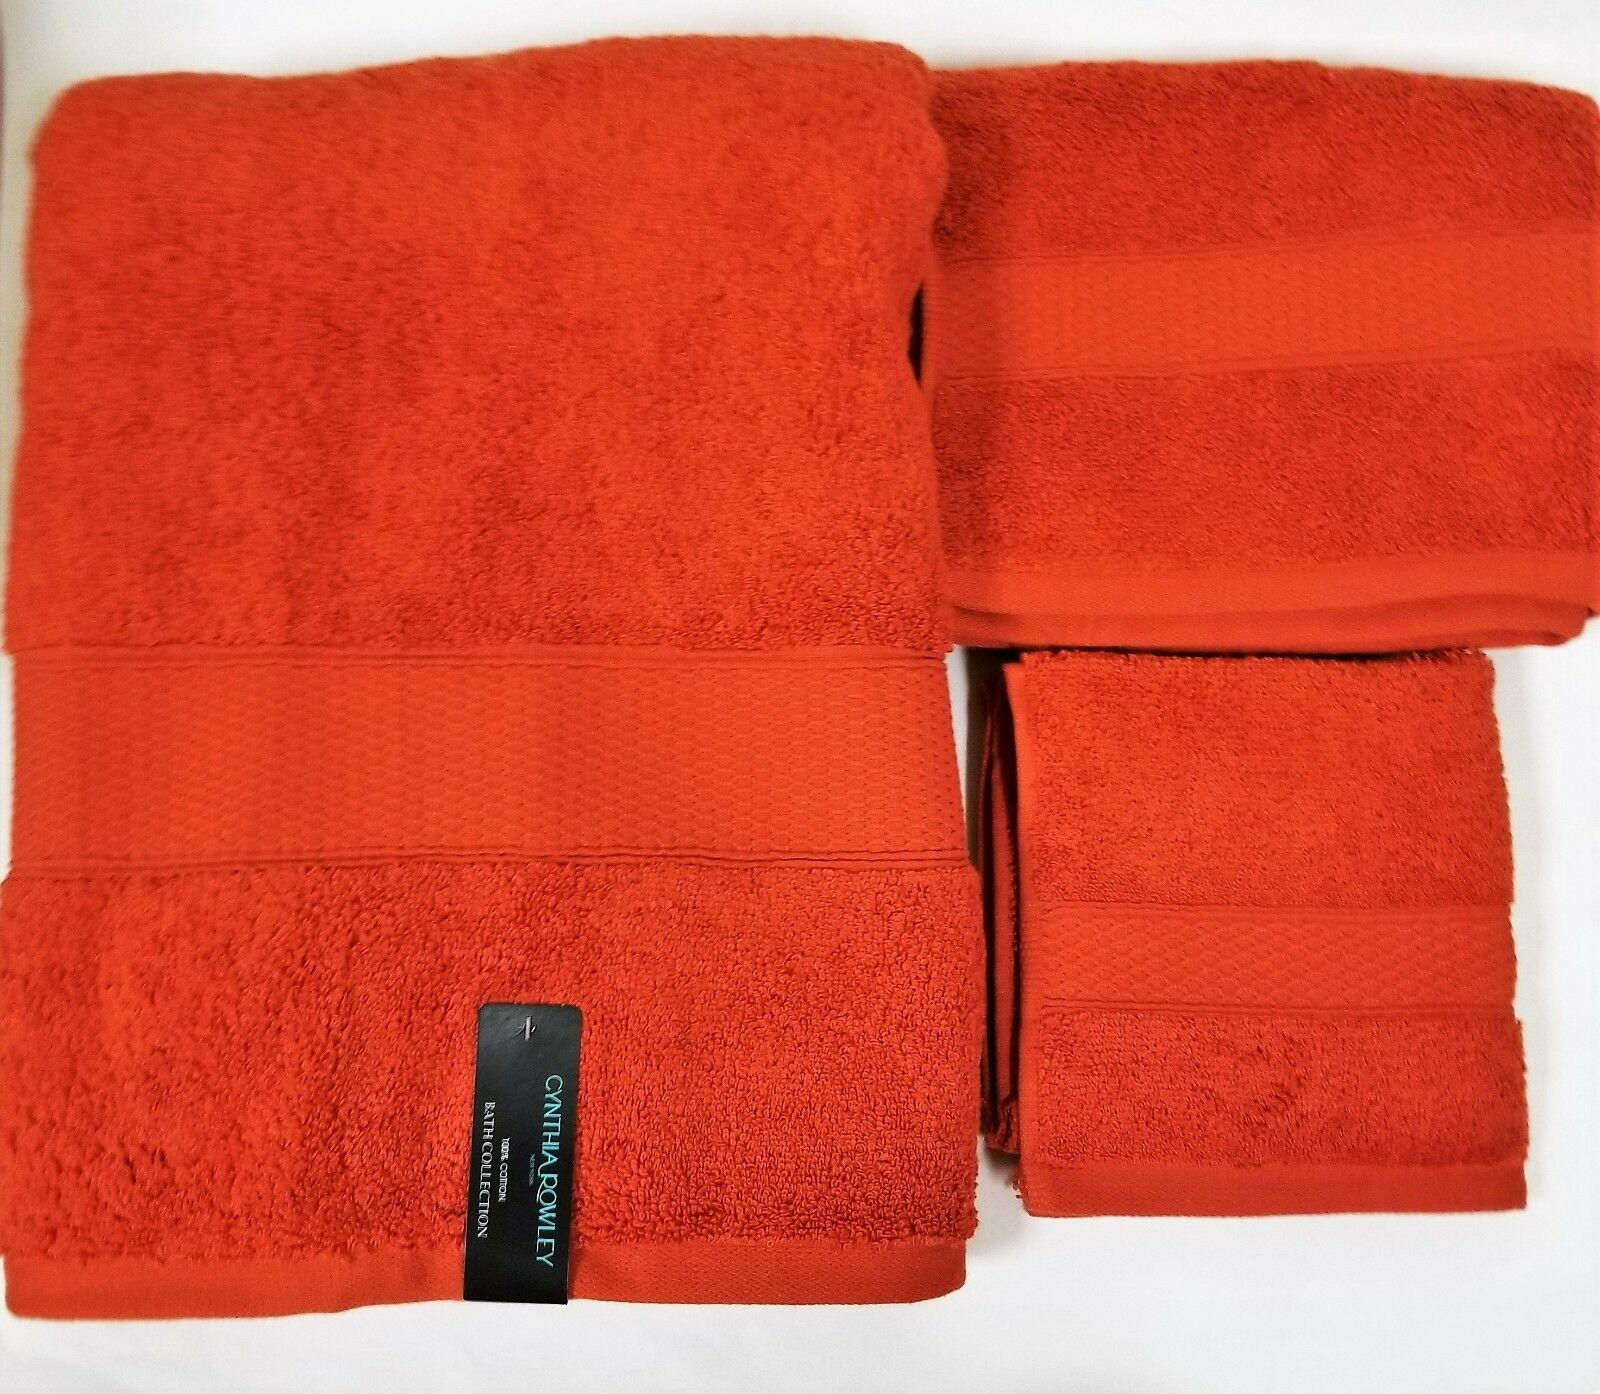 CYNTHIA ROWLEY 3 PC SET BURNT Orange,RUST 100% COTTON COTTON COTTON BATH,HAND TOWEL+WASHCLOTH 6f833a